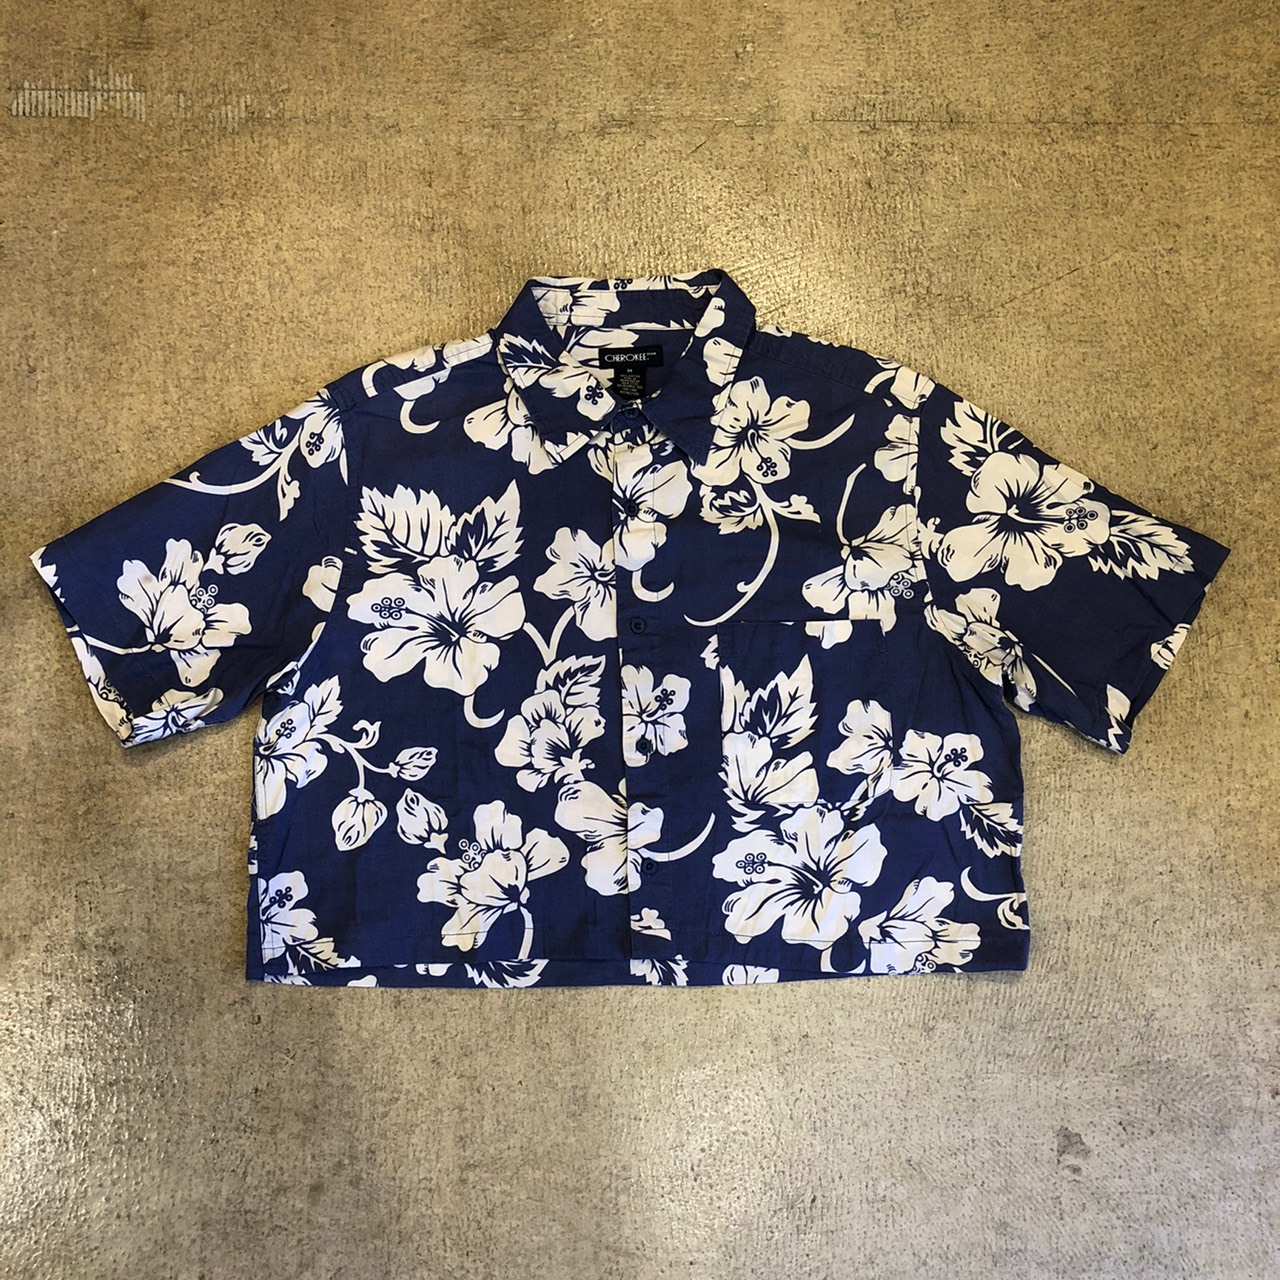 Remake Aloha Shirts No.3 ¥5,900+tax